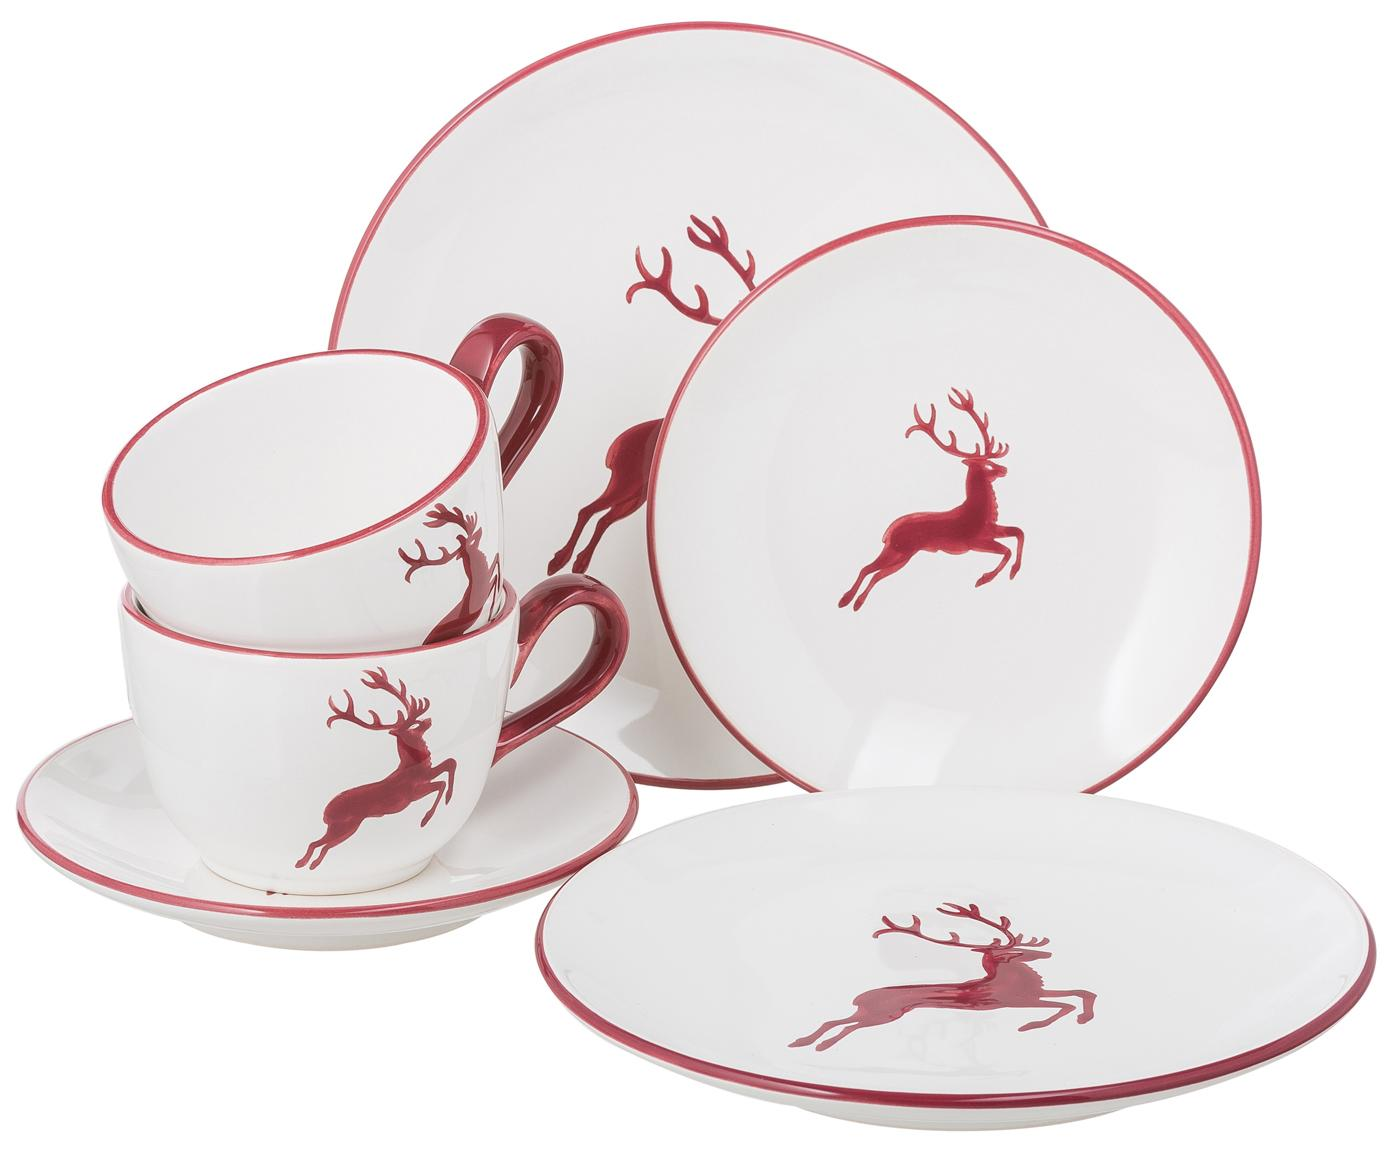 Kaffeeservice Classic Roter Hirsch, 2 Personen (6-tlg.), Keramik, Bordeauxrot, Weiß, Sondergrößen